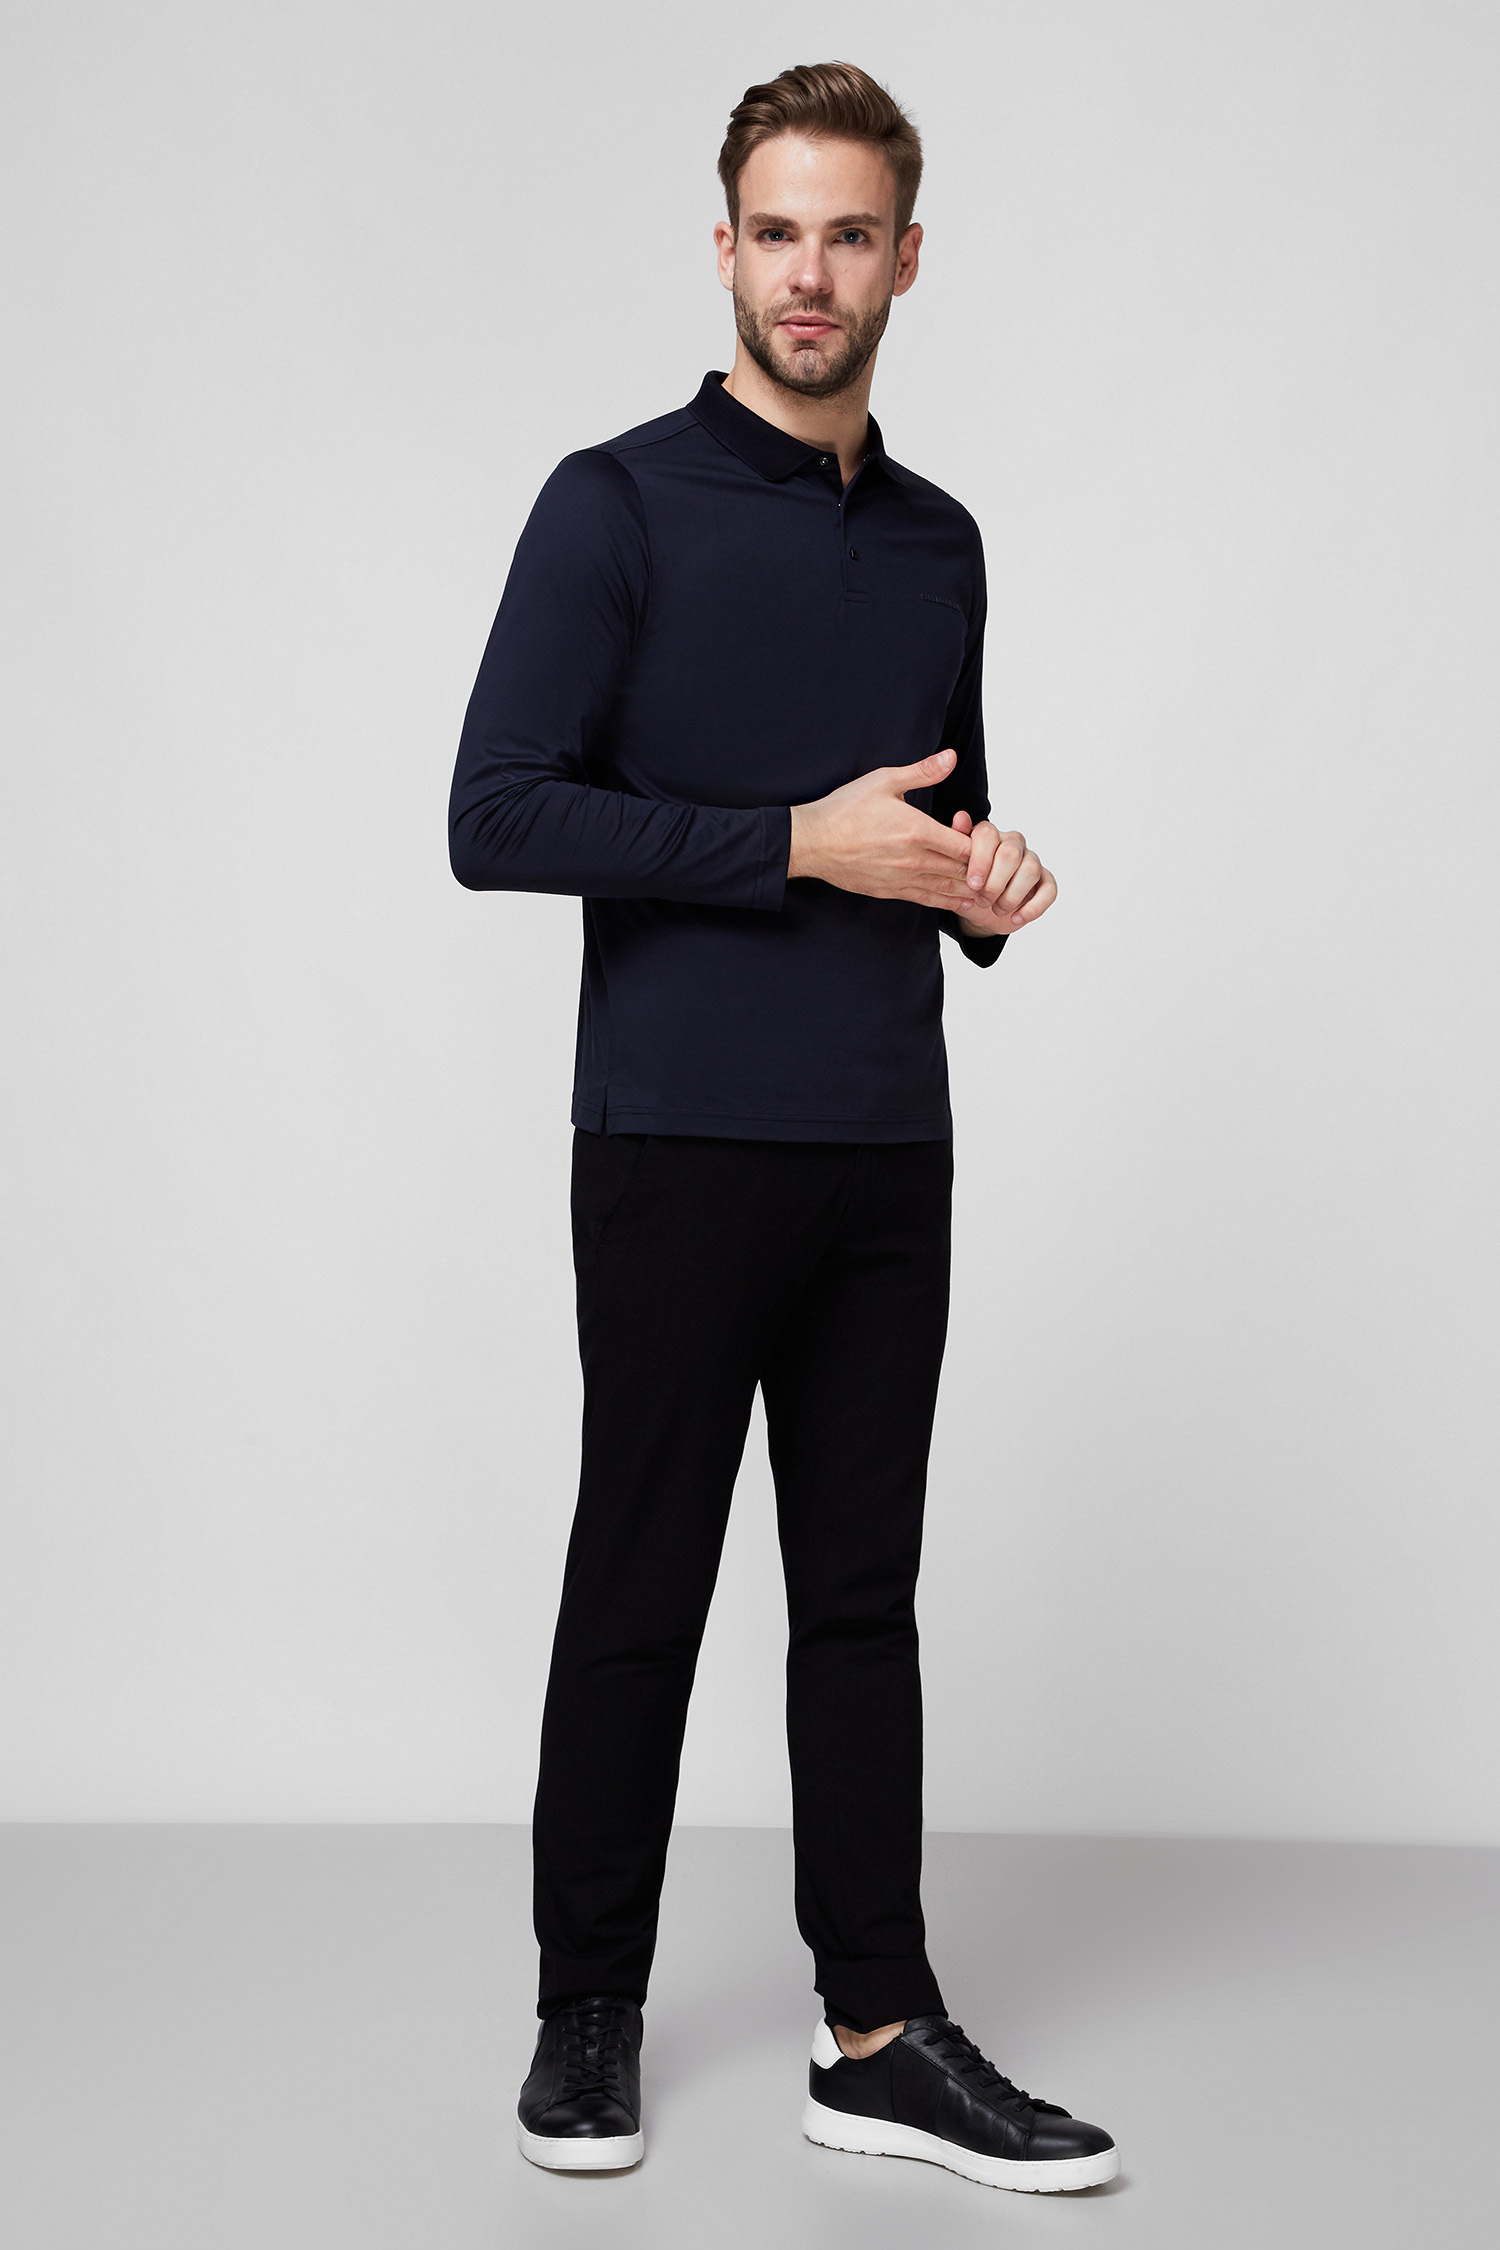 Мужское темно-синее поло Karl Lagerfeld 502200.745000;690